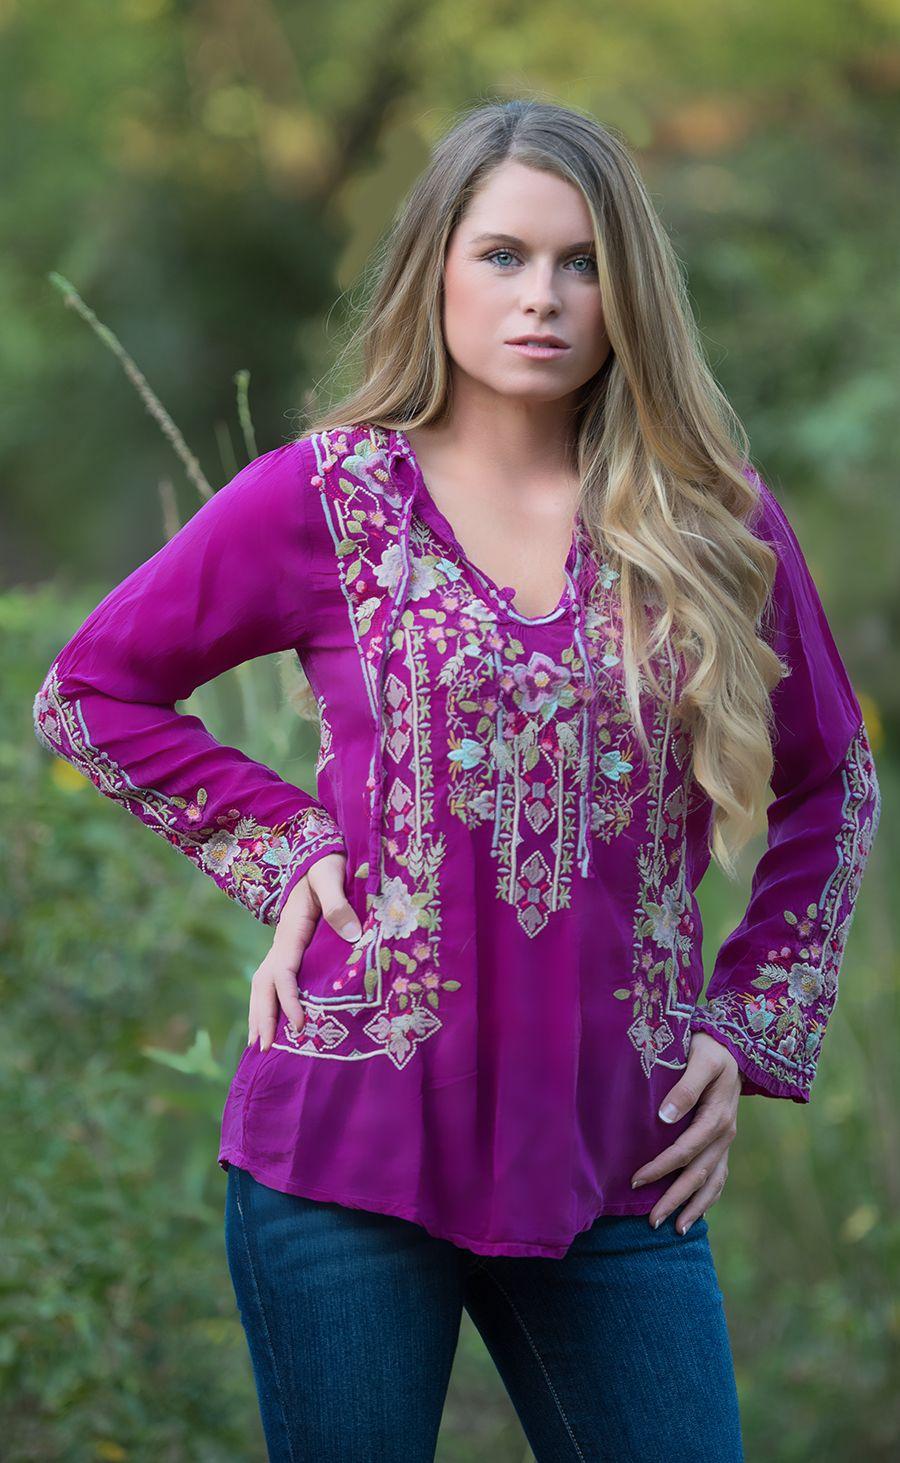 Jwla collection fabio blouse cute winter outfits pinterest